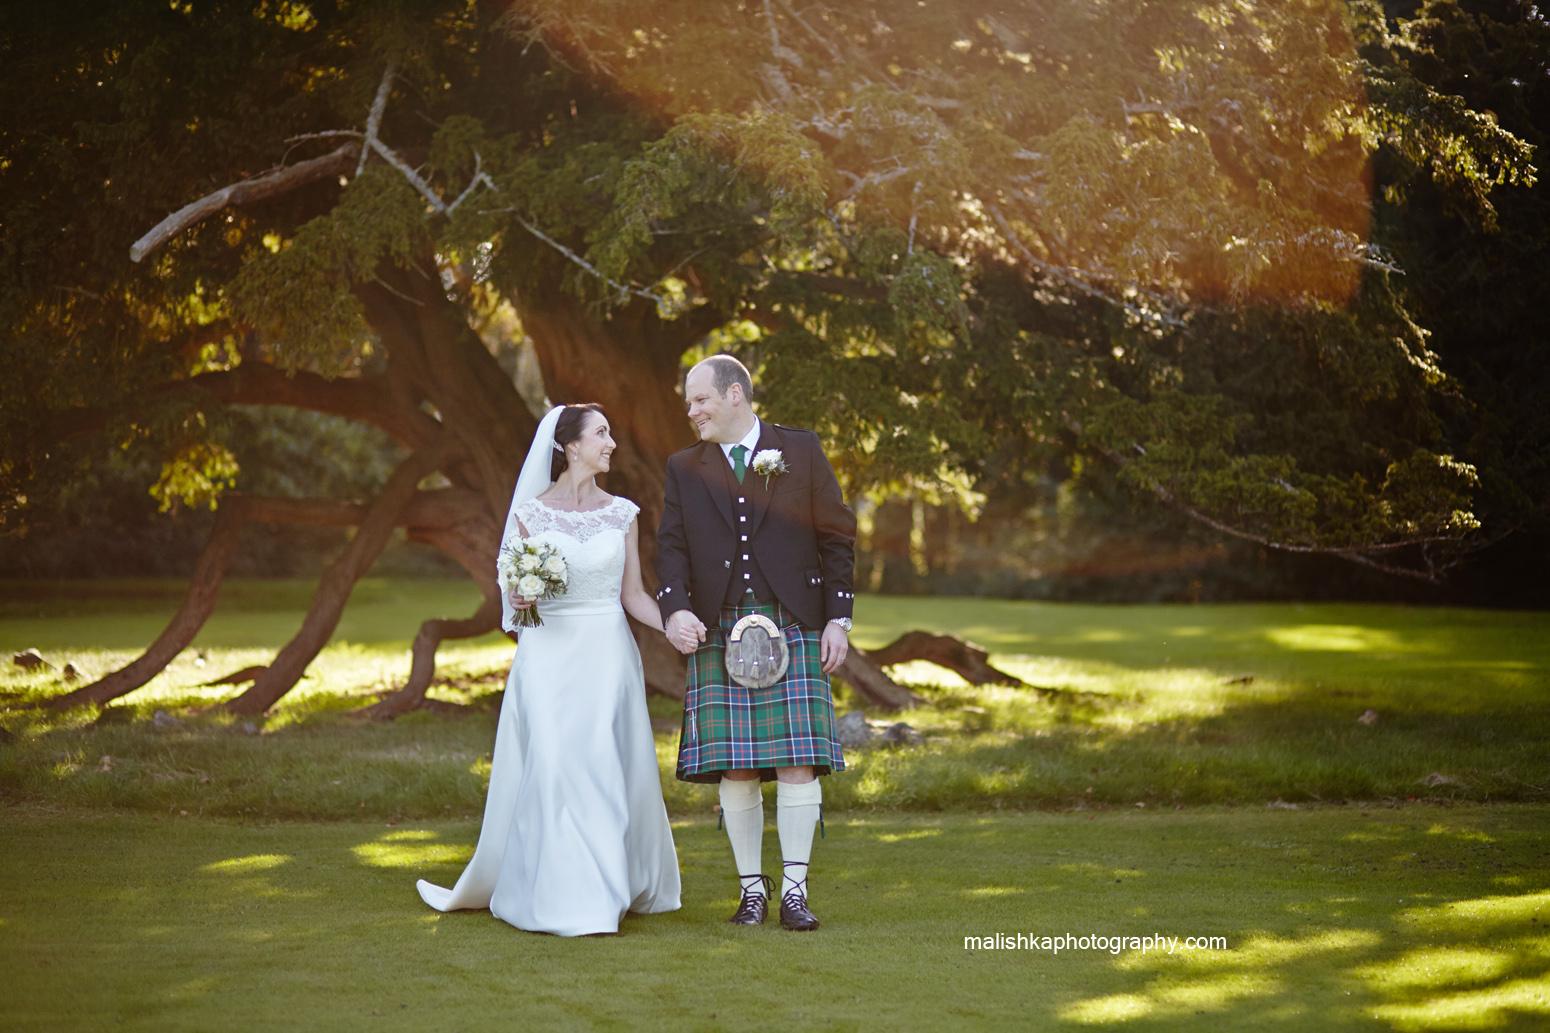 Malishka Photography capturing the wedding at Oxenfoord Castle